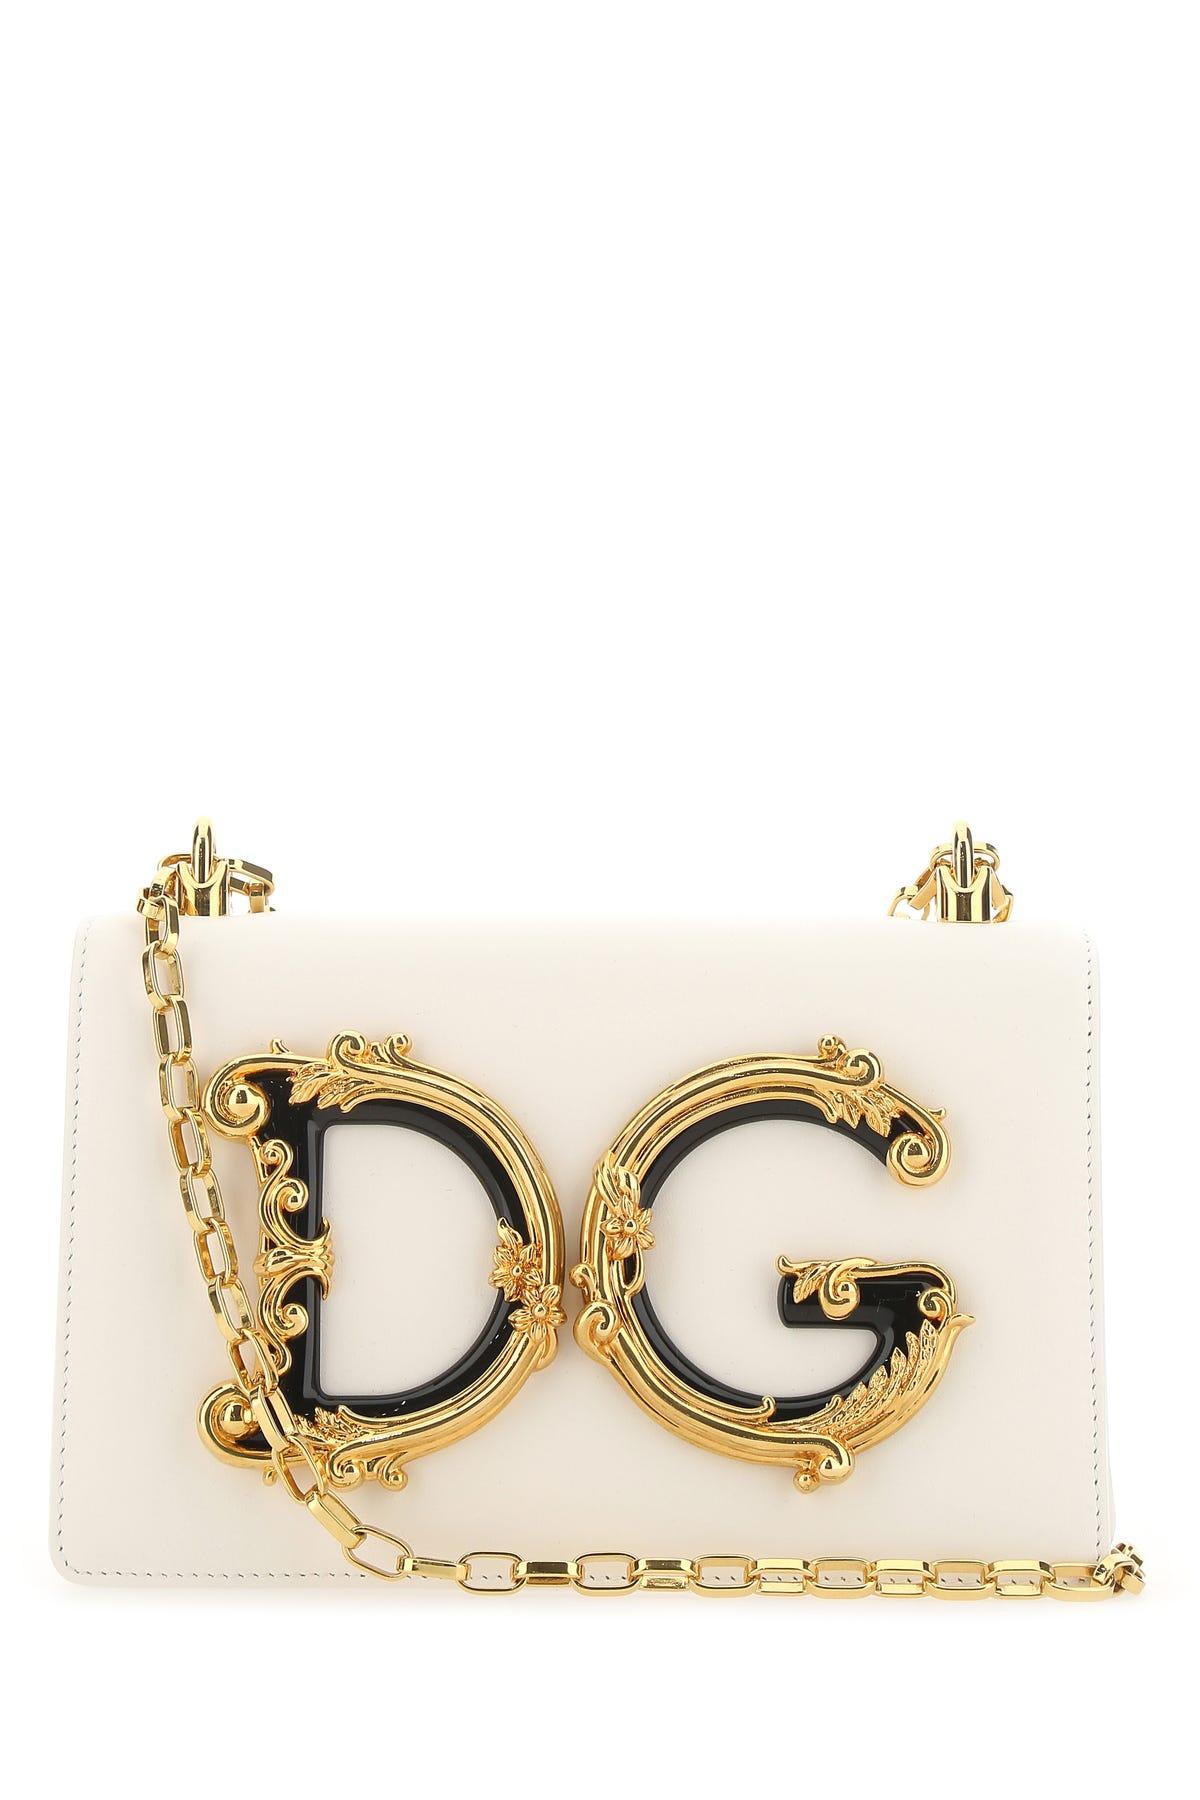 Dolce & Gabbana Leathers BORSA-TU